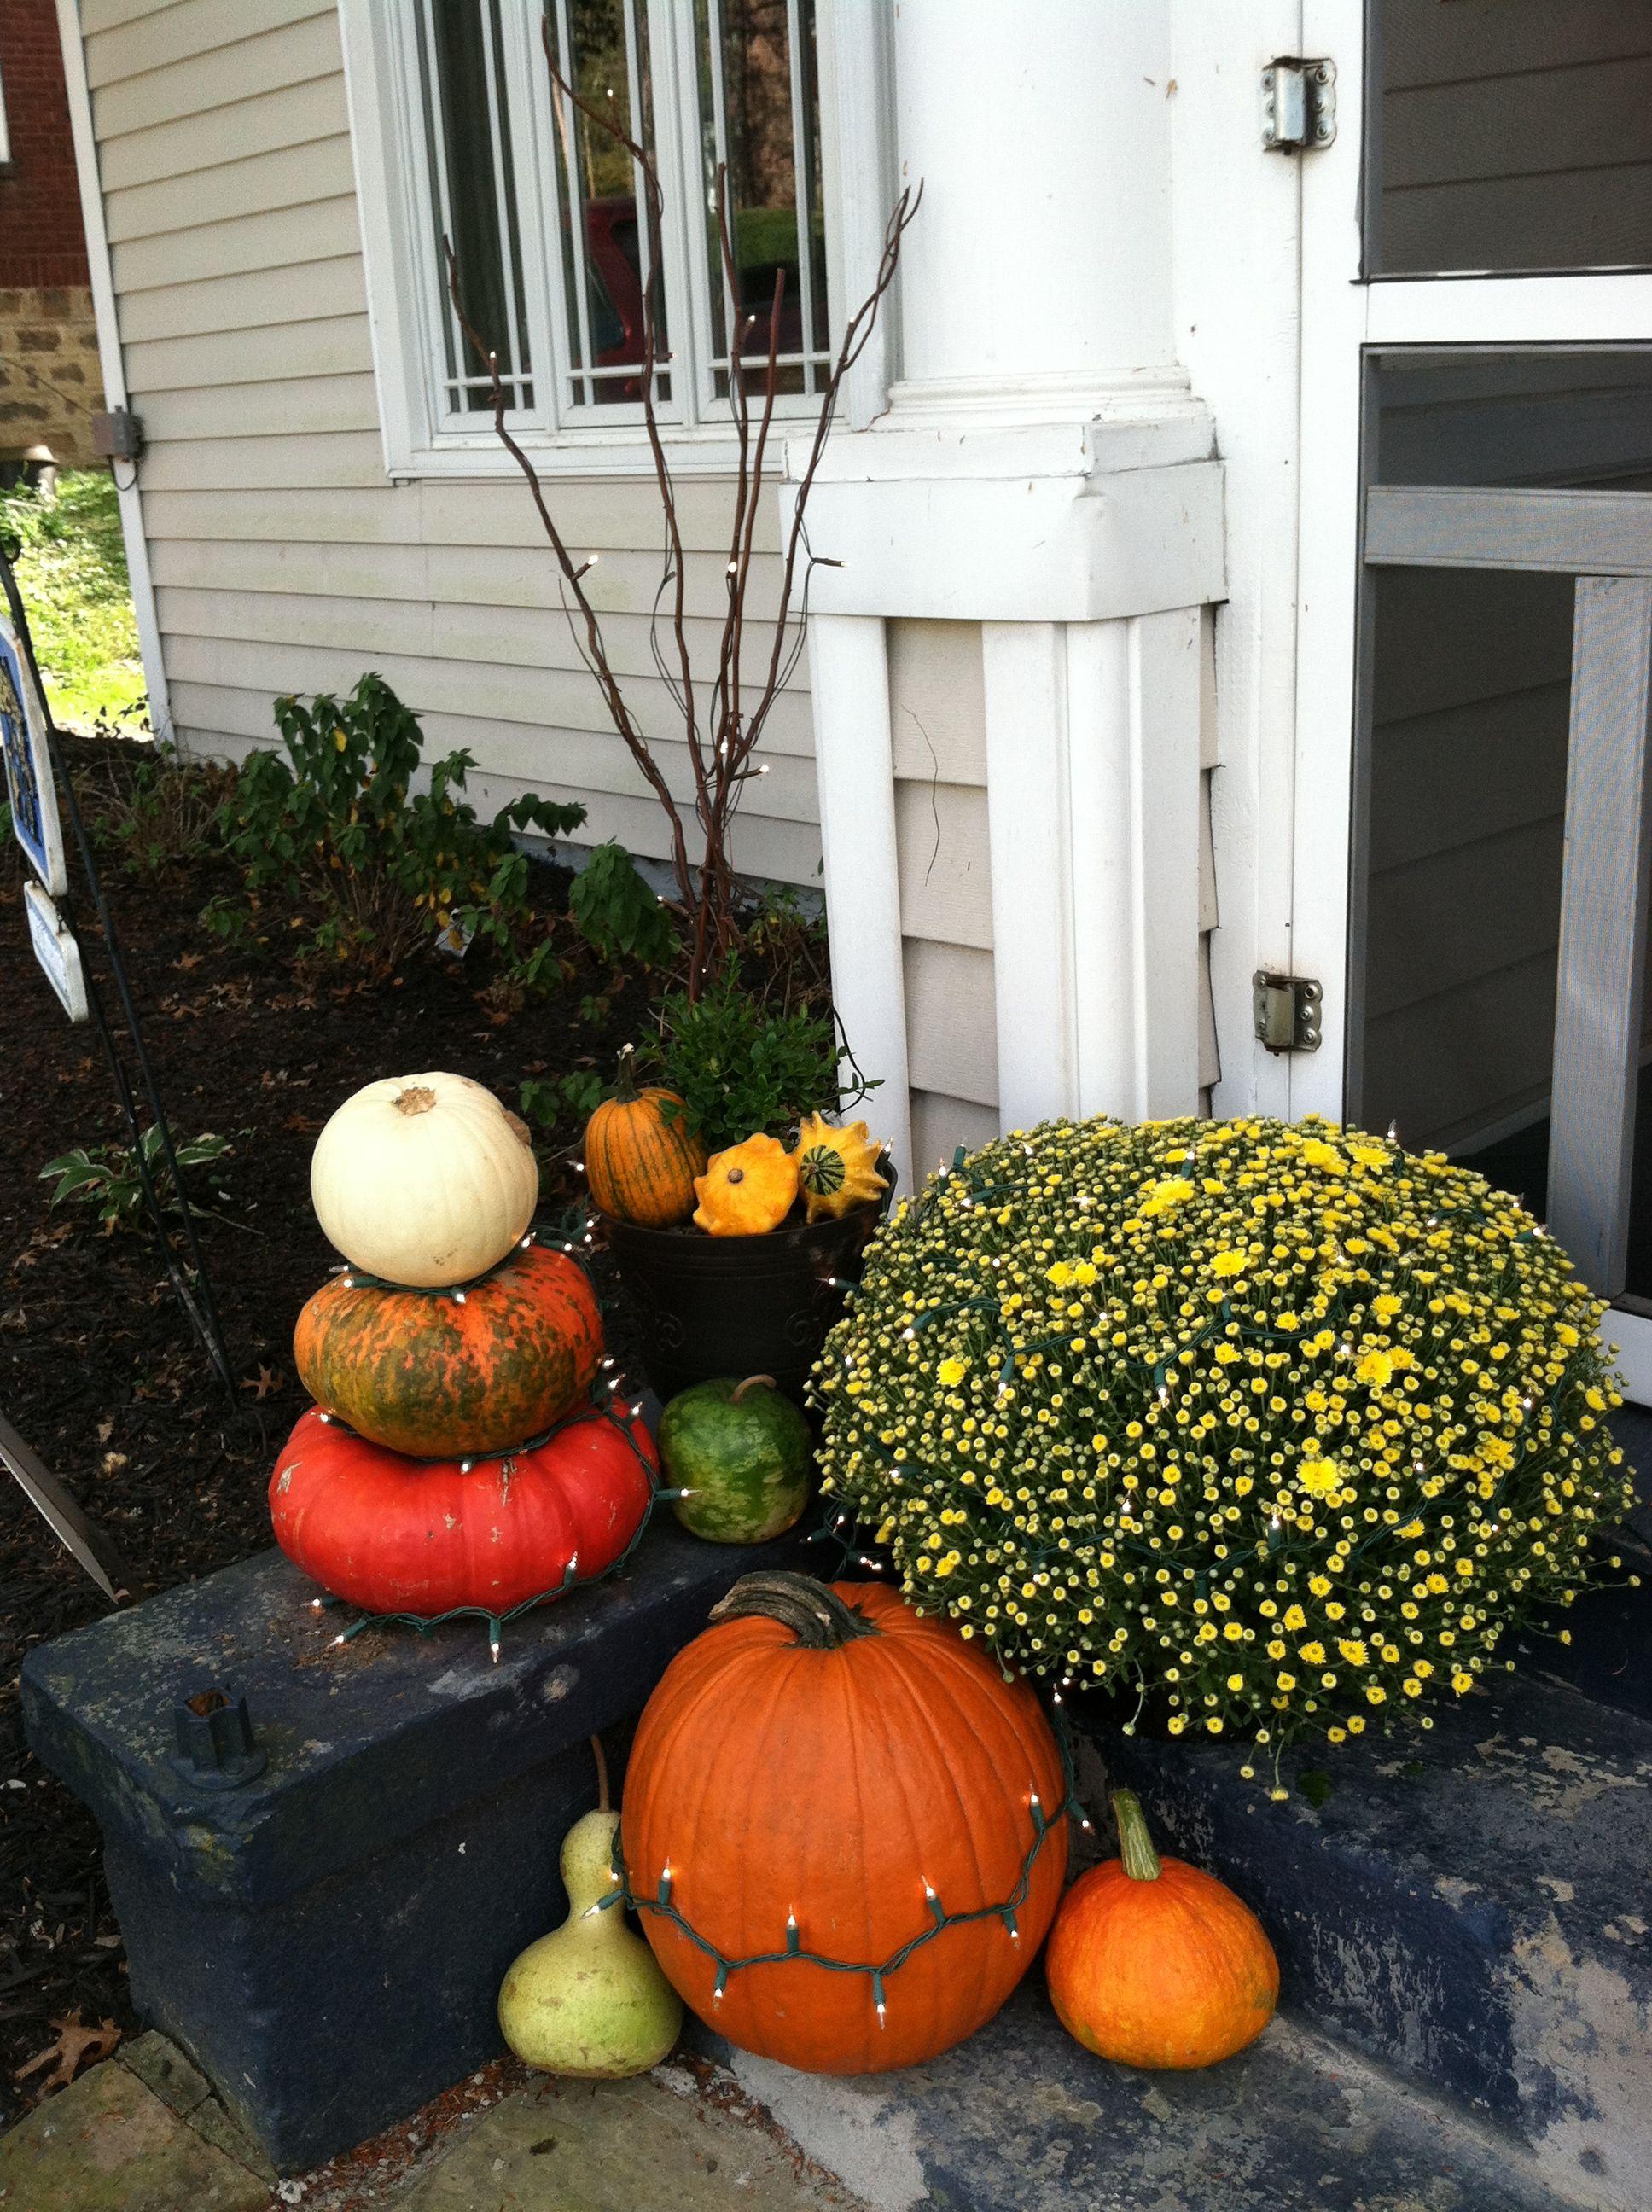 fall halloween decorations outside halloween. Black Bedroom Furniture Sets. Home Design Ideas